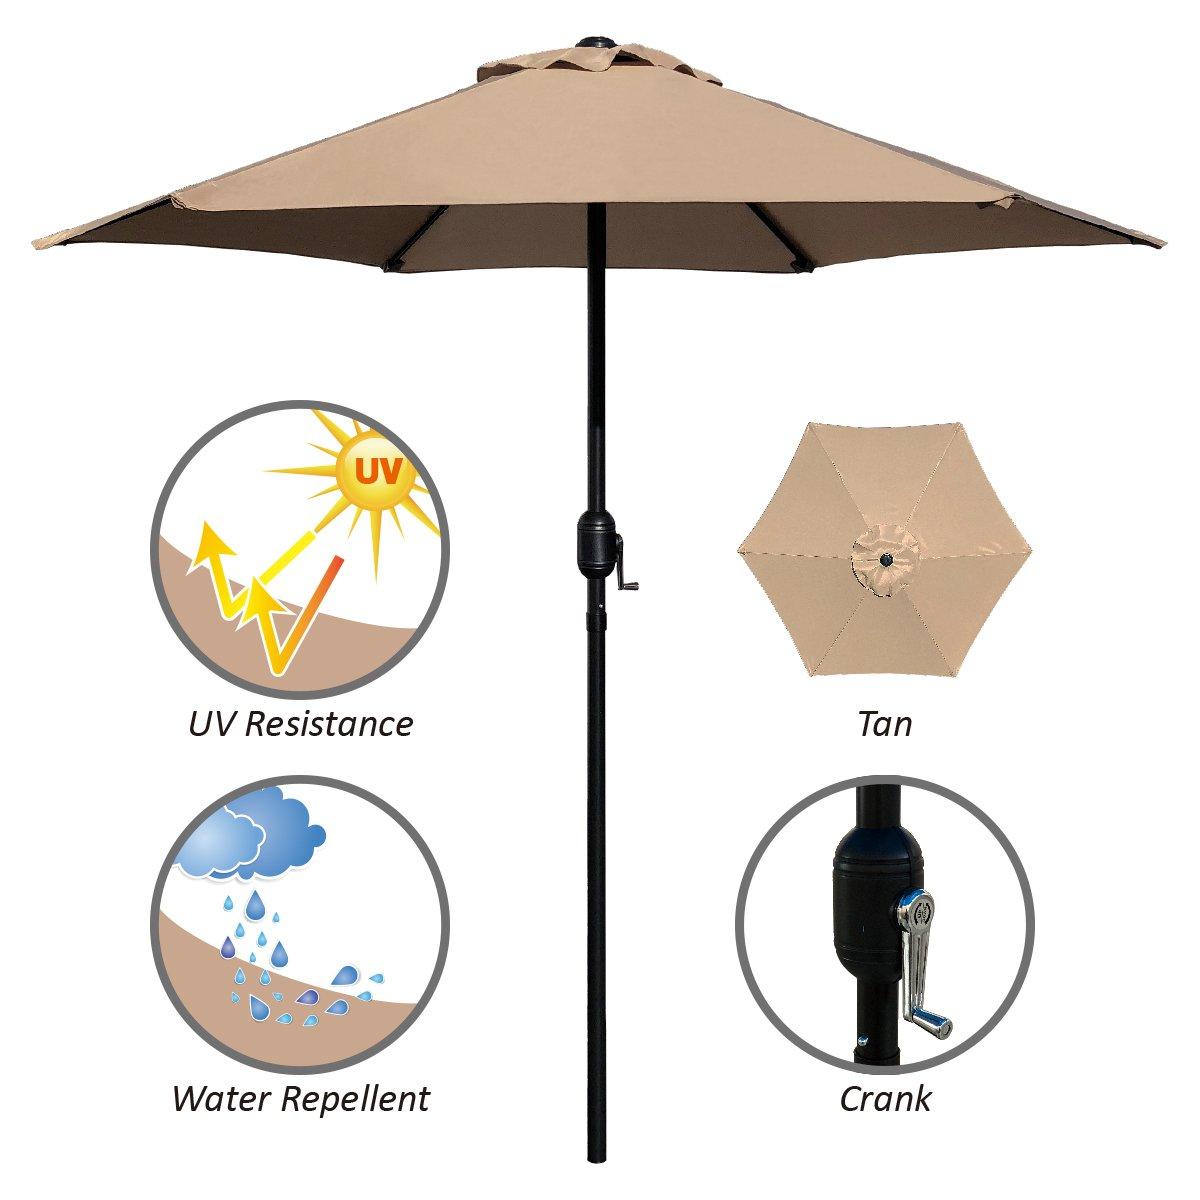 ABBLE Outdoor Patio Umbrella 7.5 Ft with Crank, Weather Resistant, UV Protective Umbrella, Durable, 6 Sturdy Steel Ribs, Market Outdoor Table Umbrella, Tan